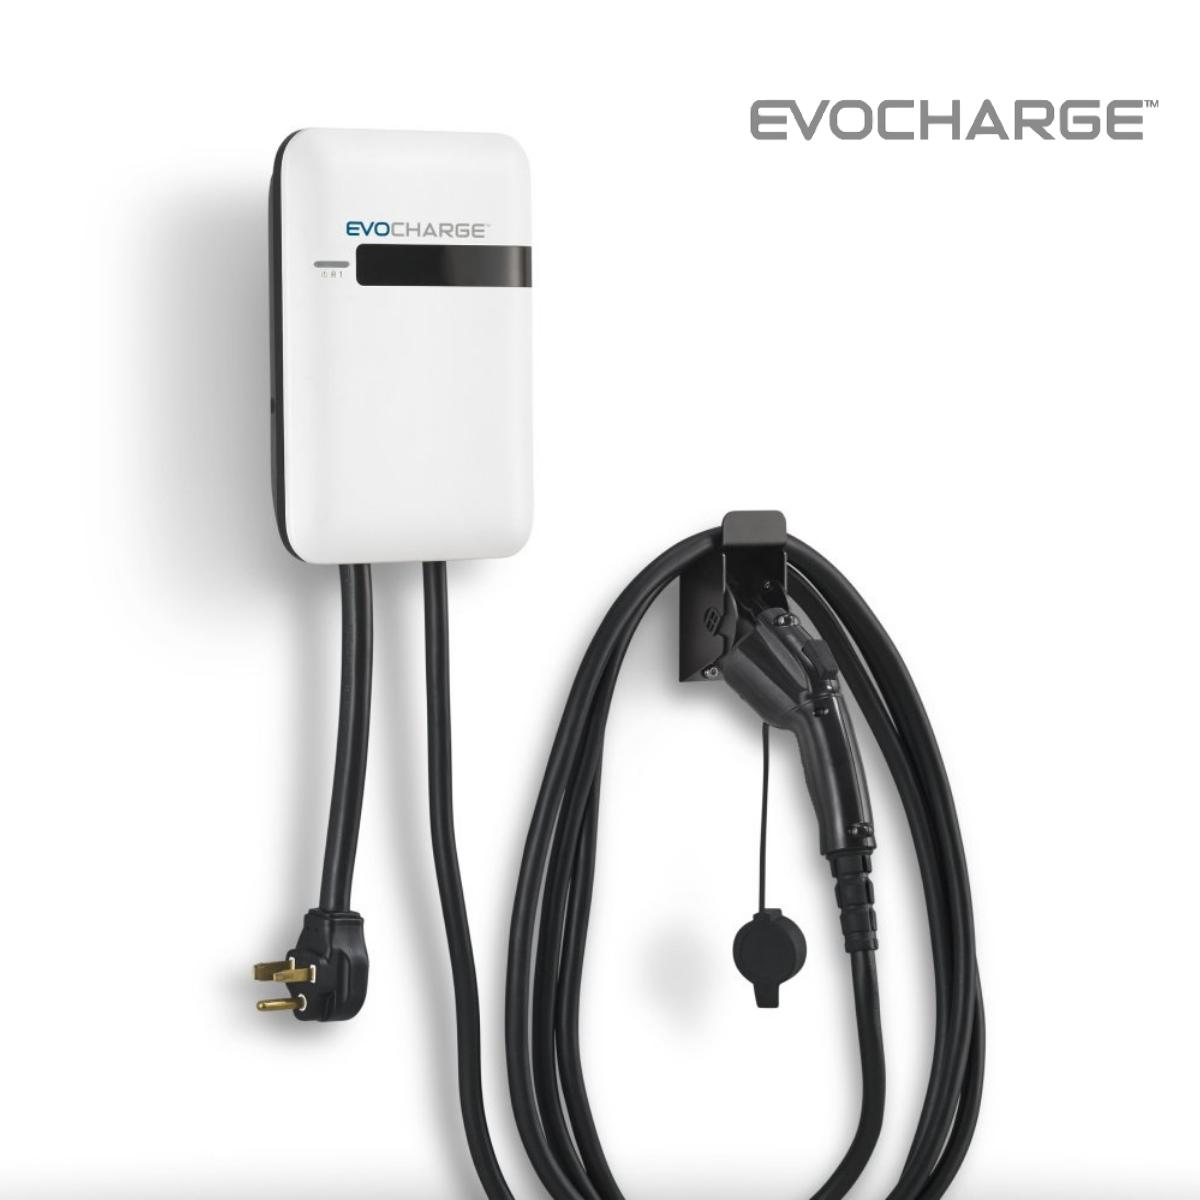 EvoCharge